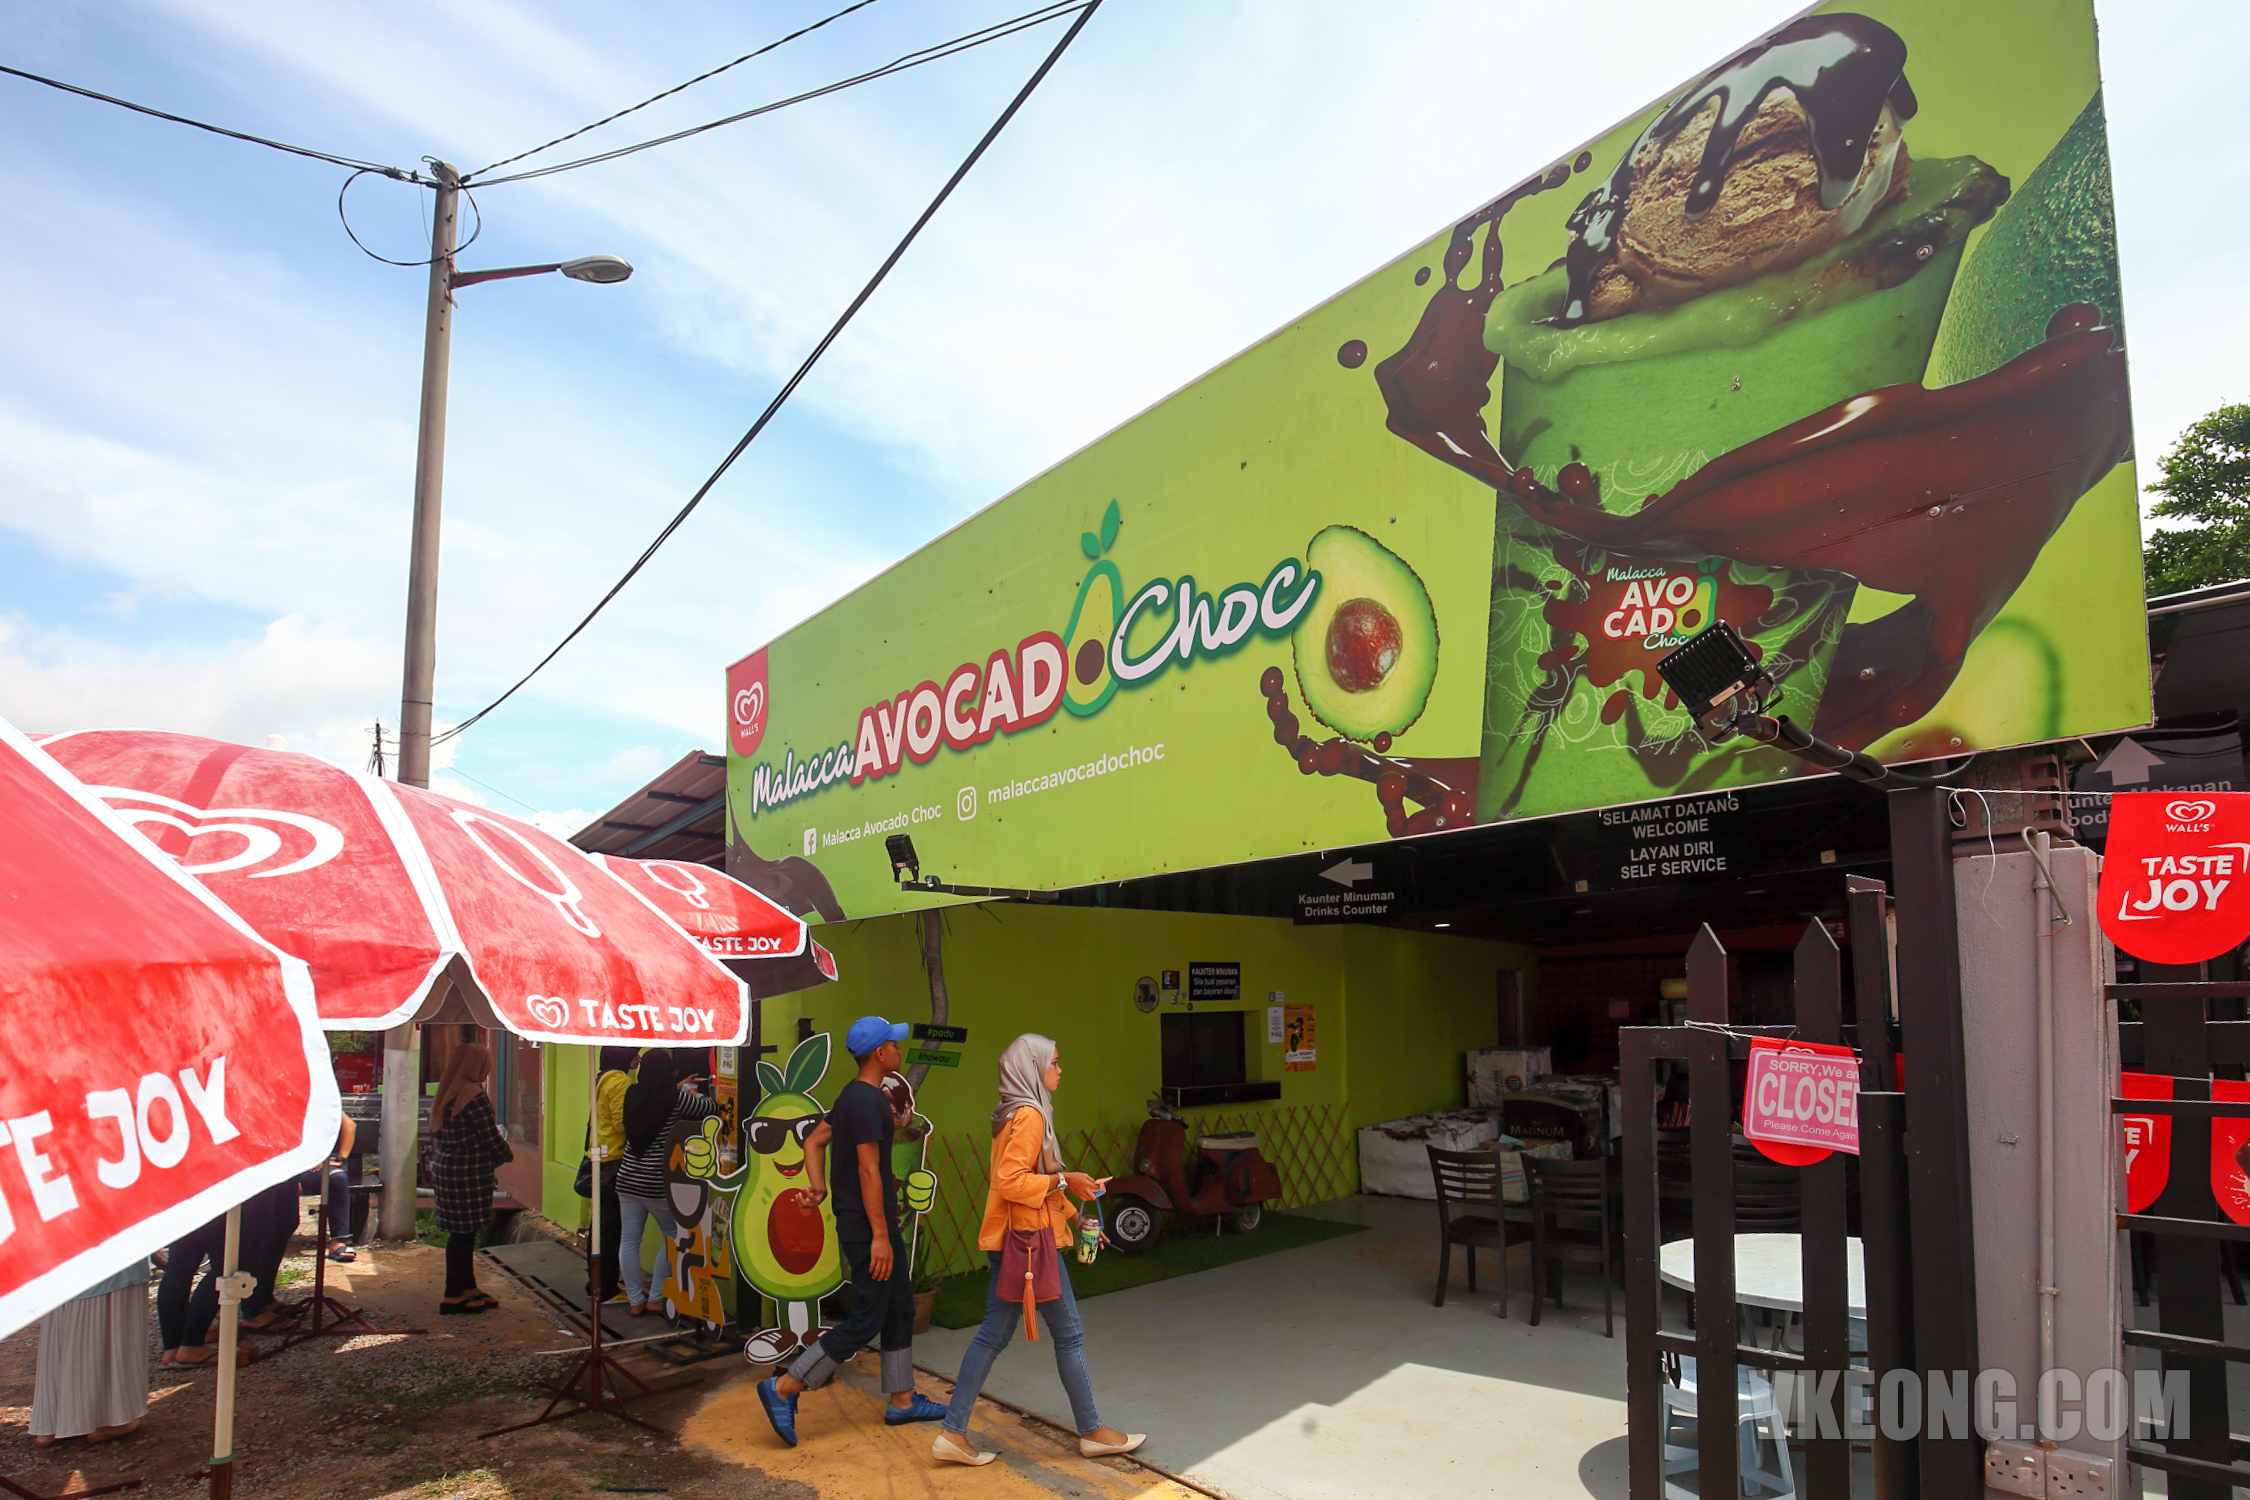 Malacca-Avocado-Choc